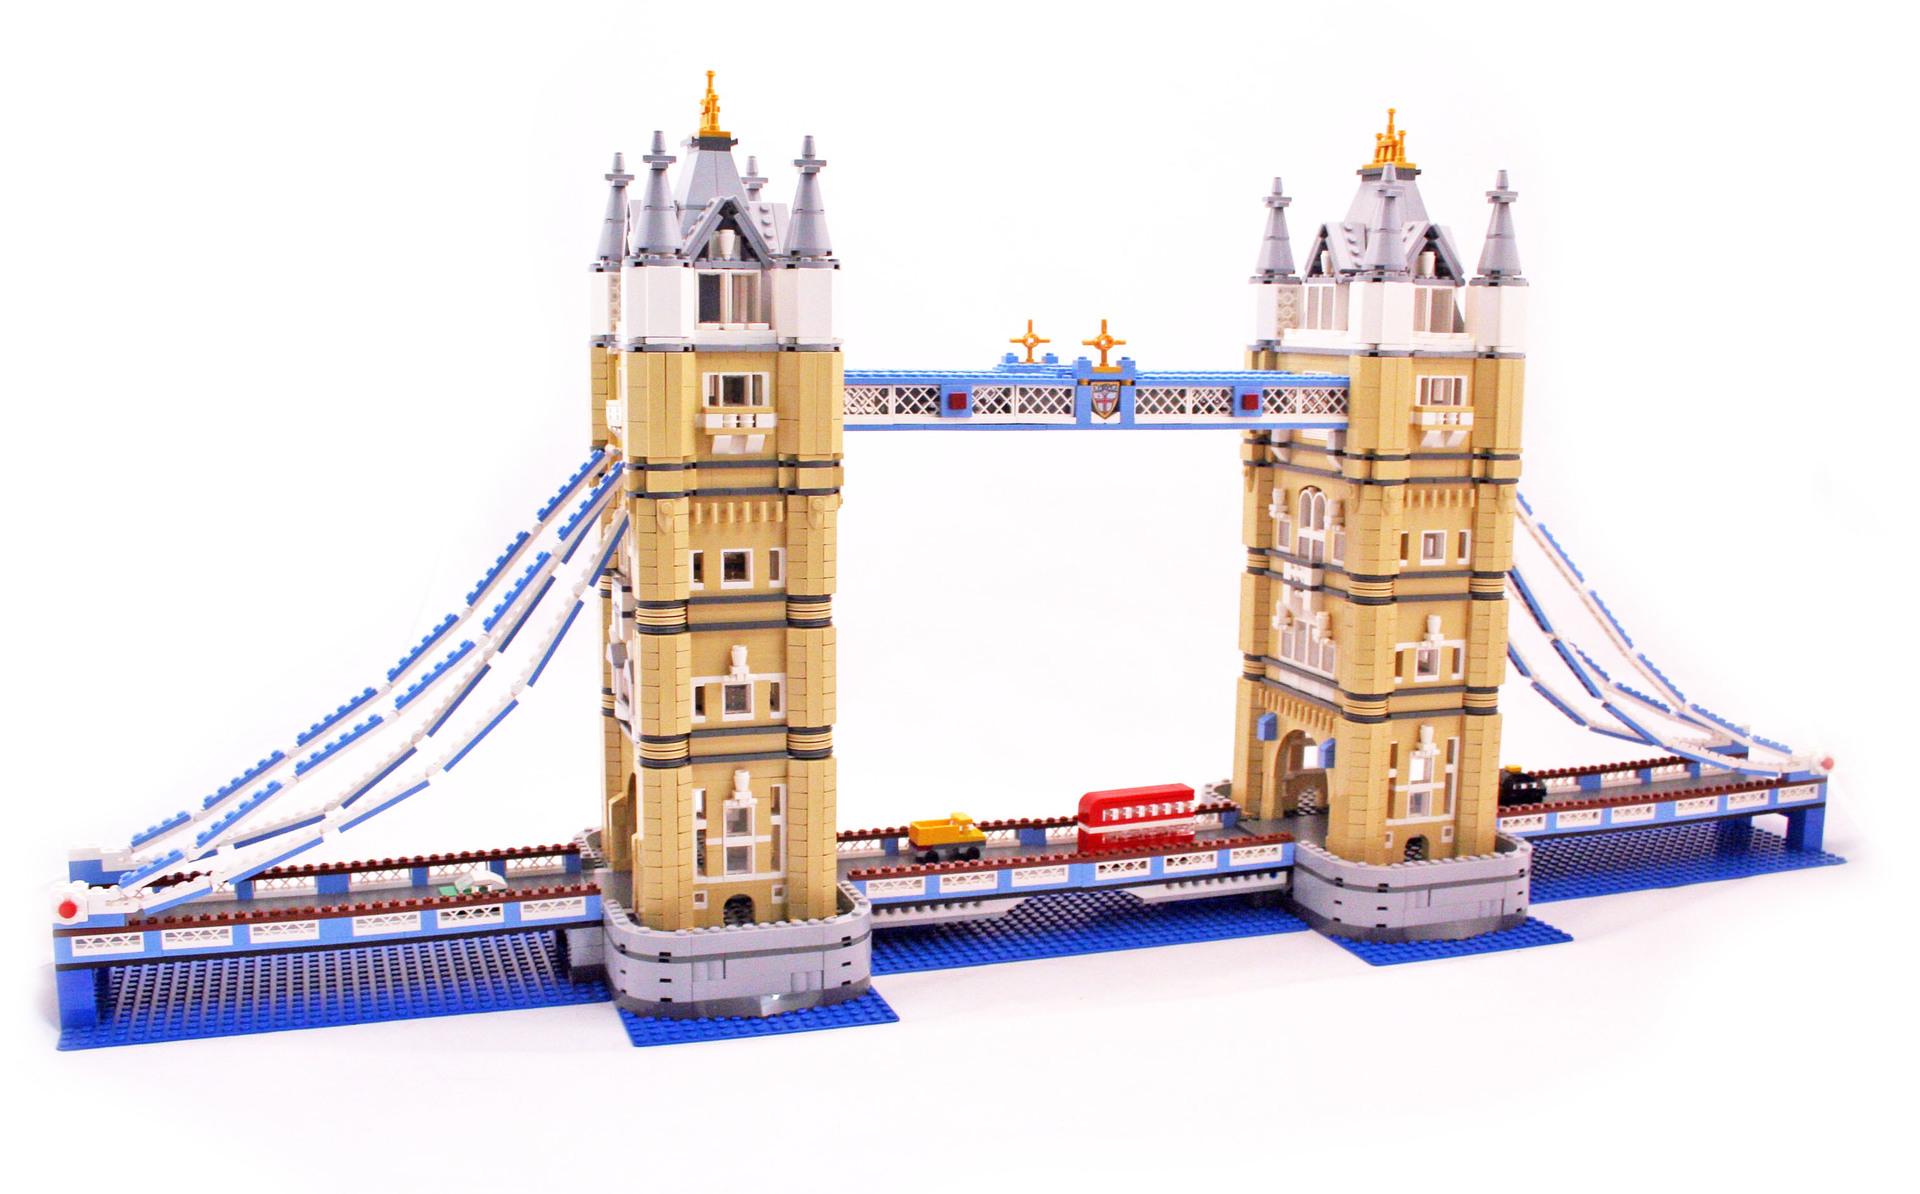 10214 tower bridge instructions